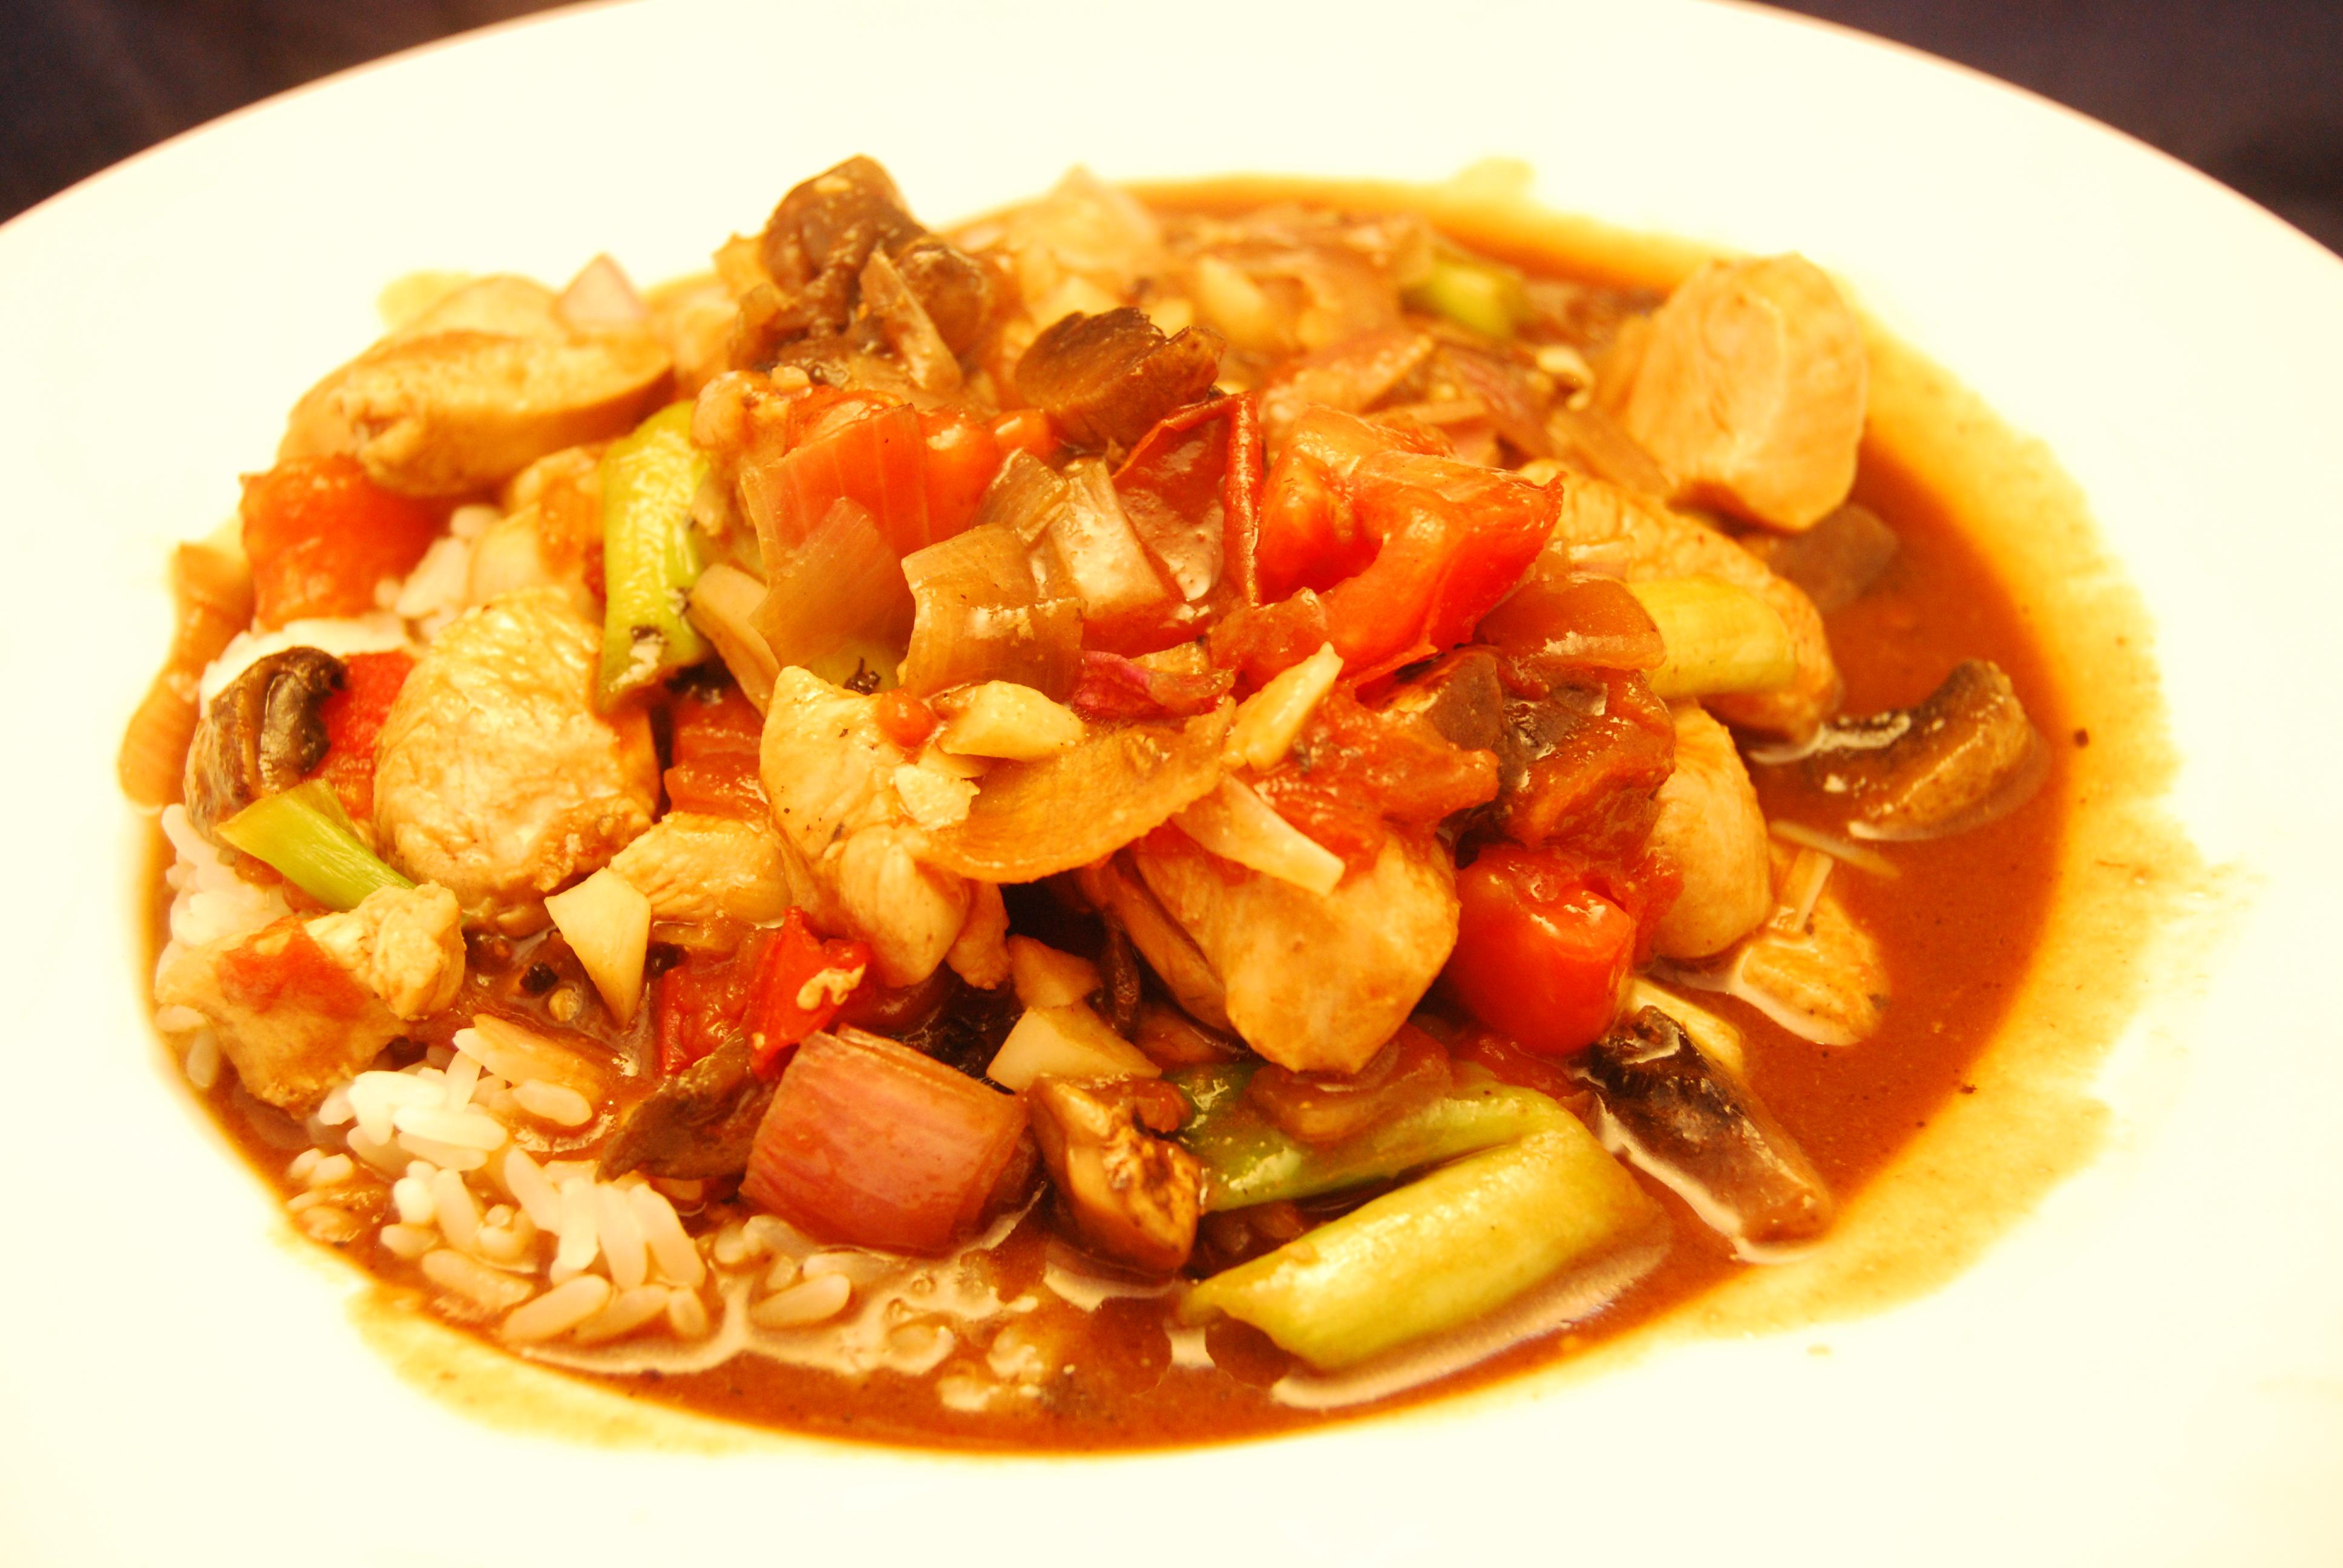 Hühnchenbrustfilet mit Gemüse in Hoisin-Sauce mit Reis